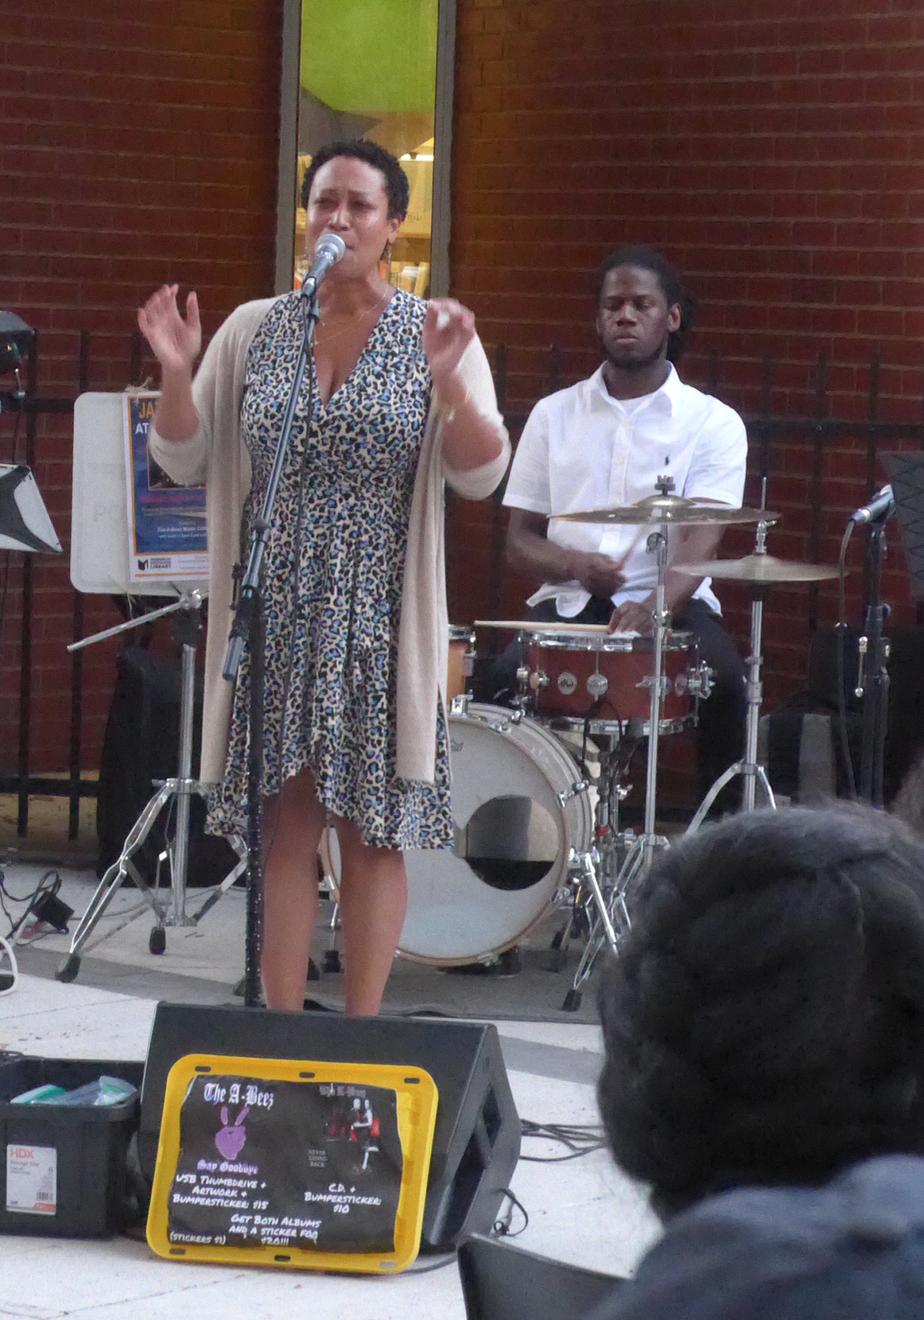 Vocalist Melissa Bolling